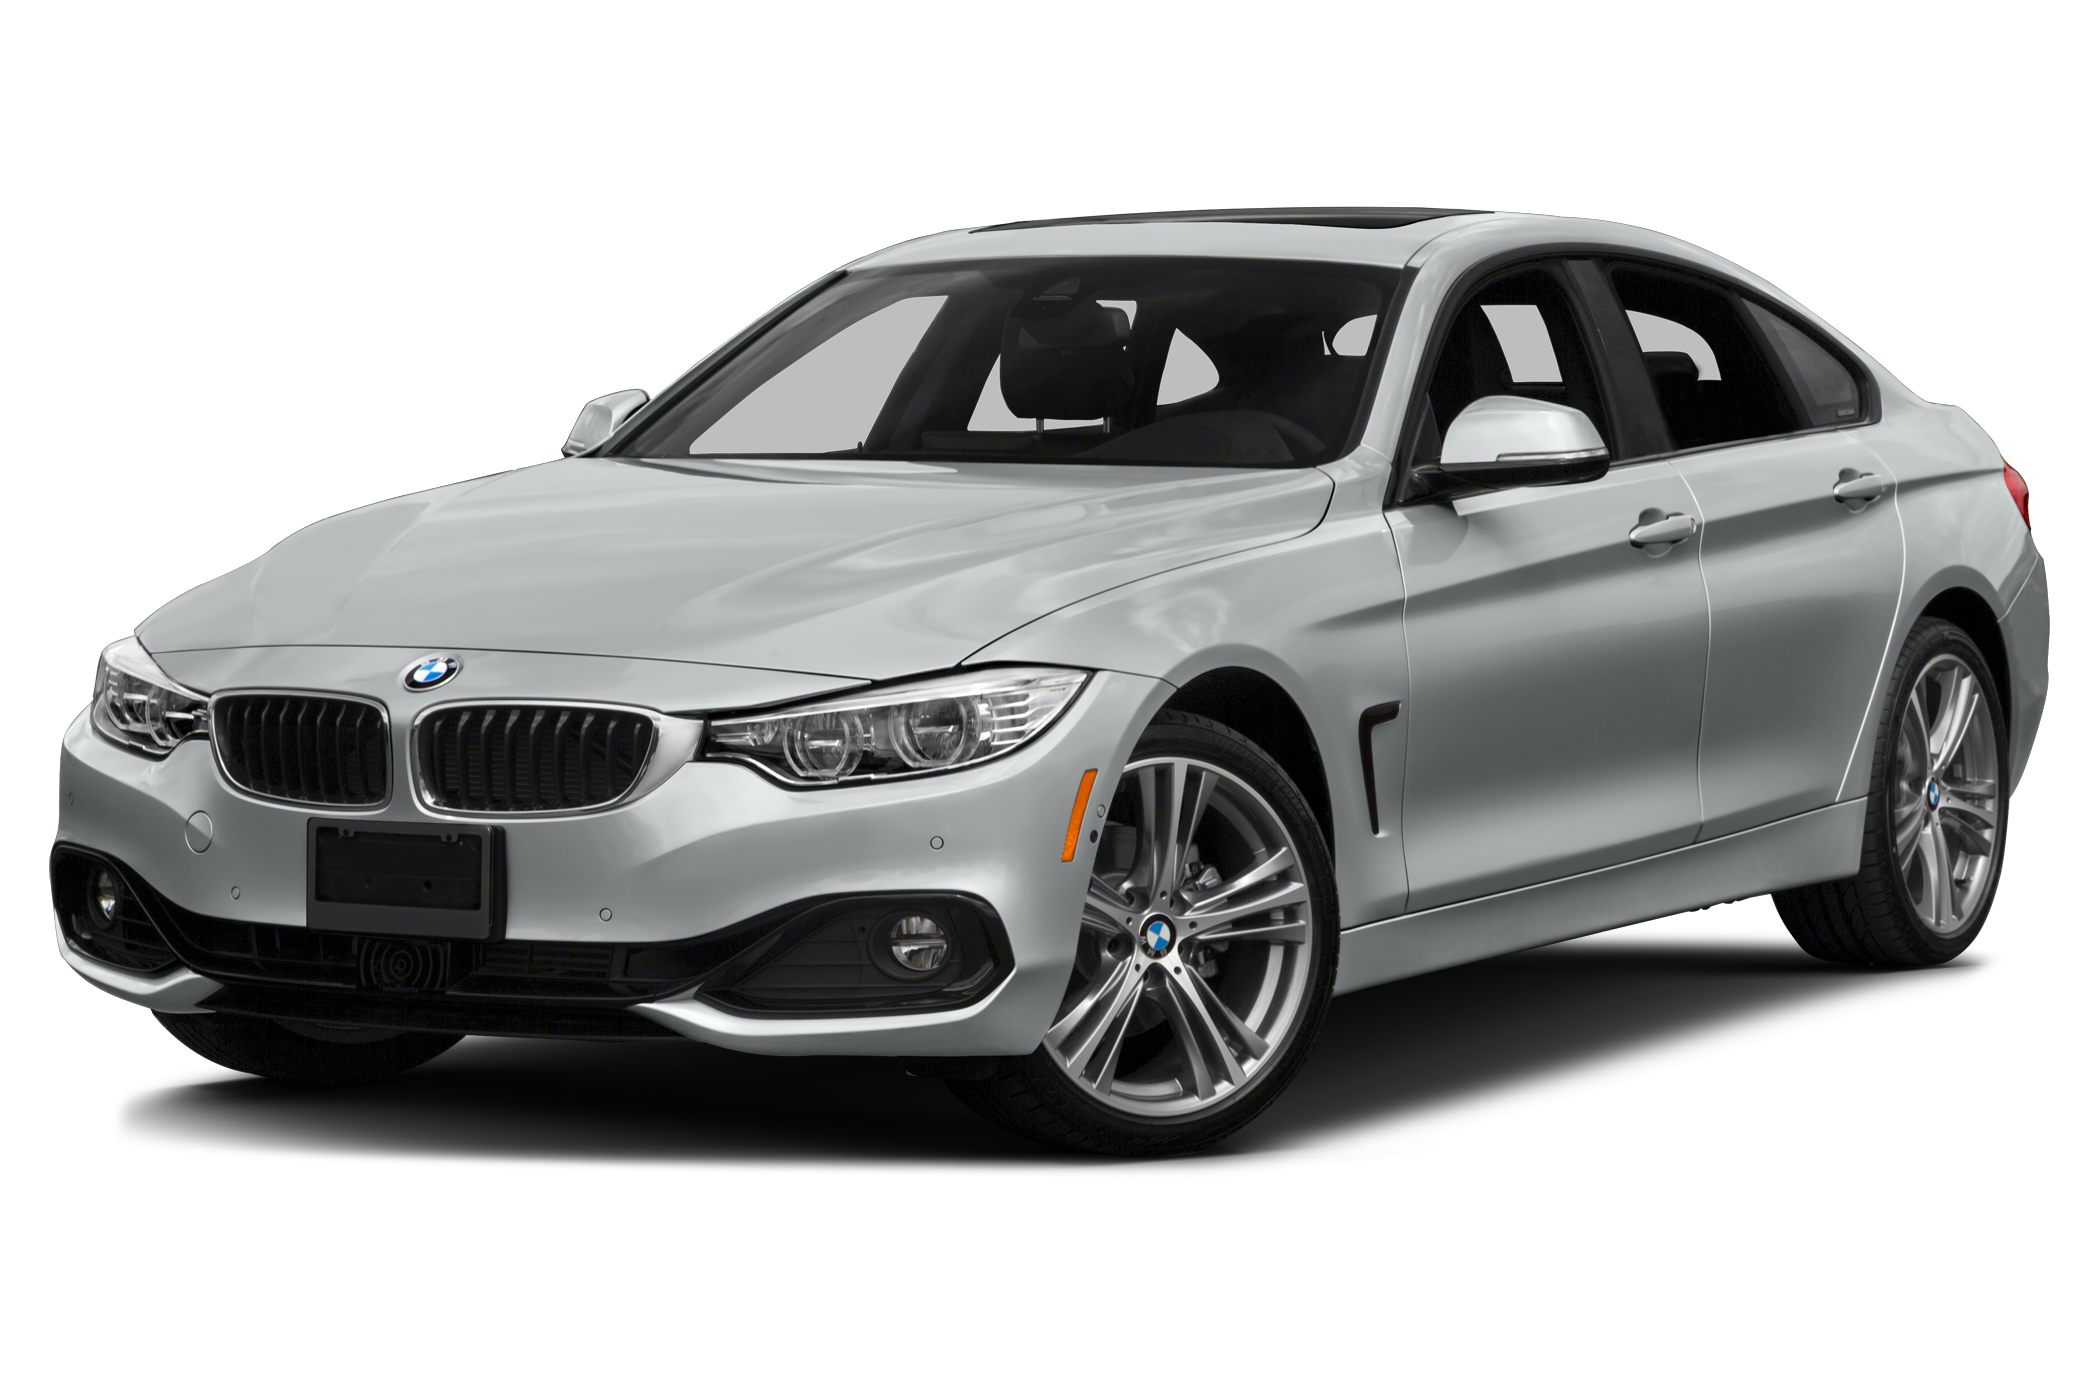 2015 BMW 4 Series 428i Gran Coupe Miles 19900Stock 502387A VIN WBA4A9C53FD416309